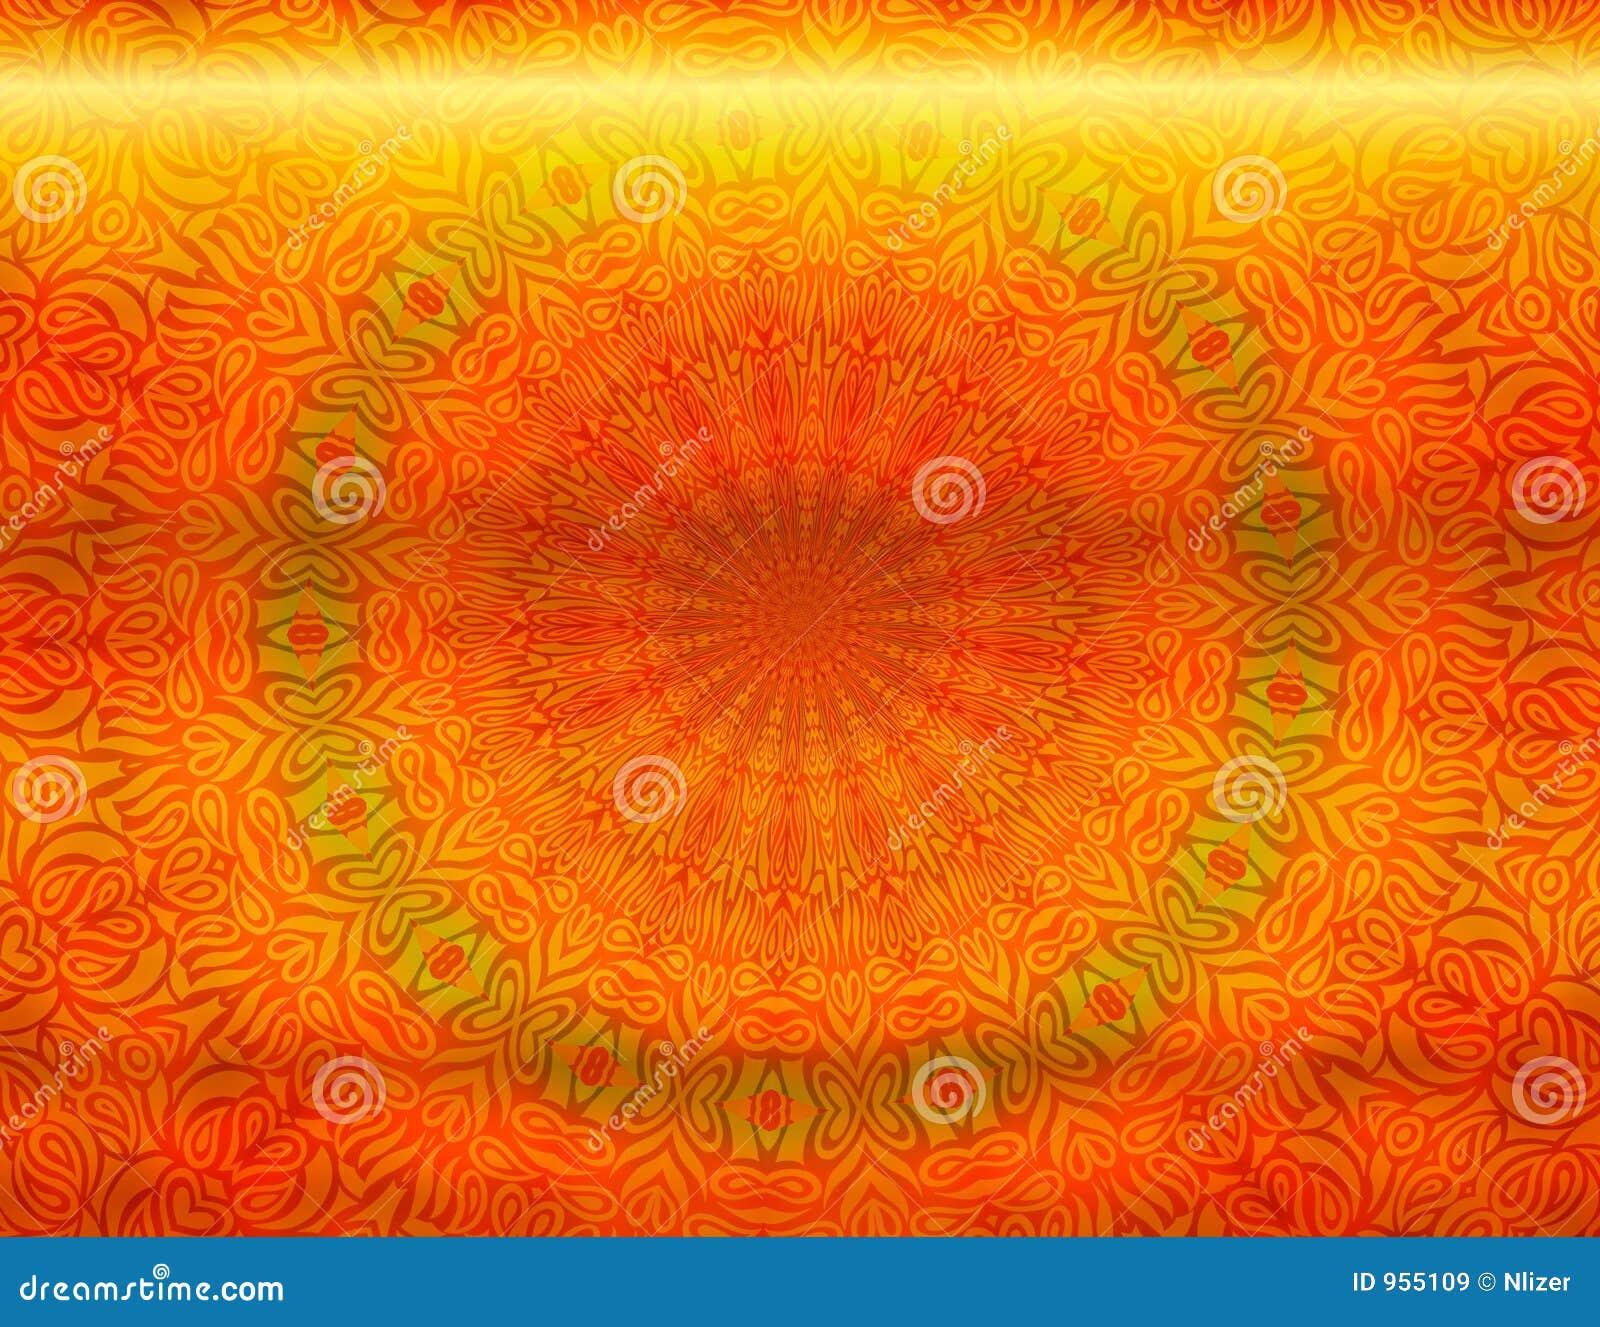 Metallic Batik Background Wallpaper Stock Illustration